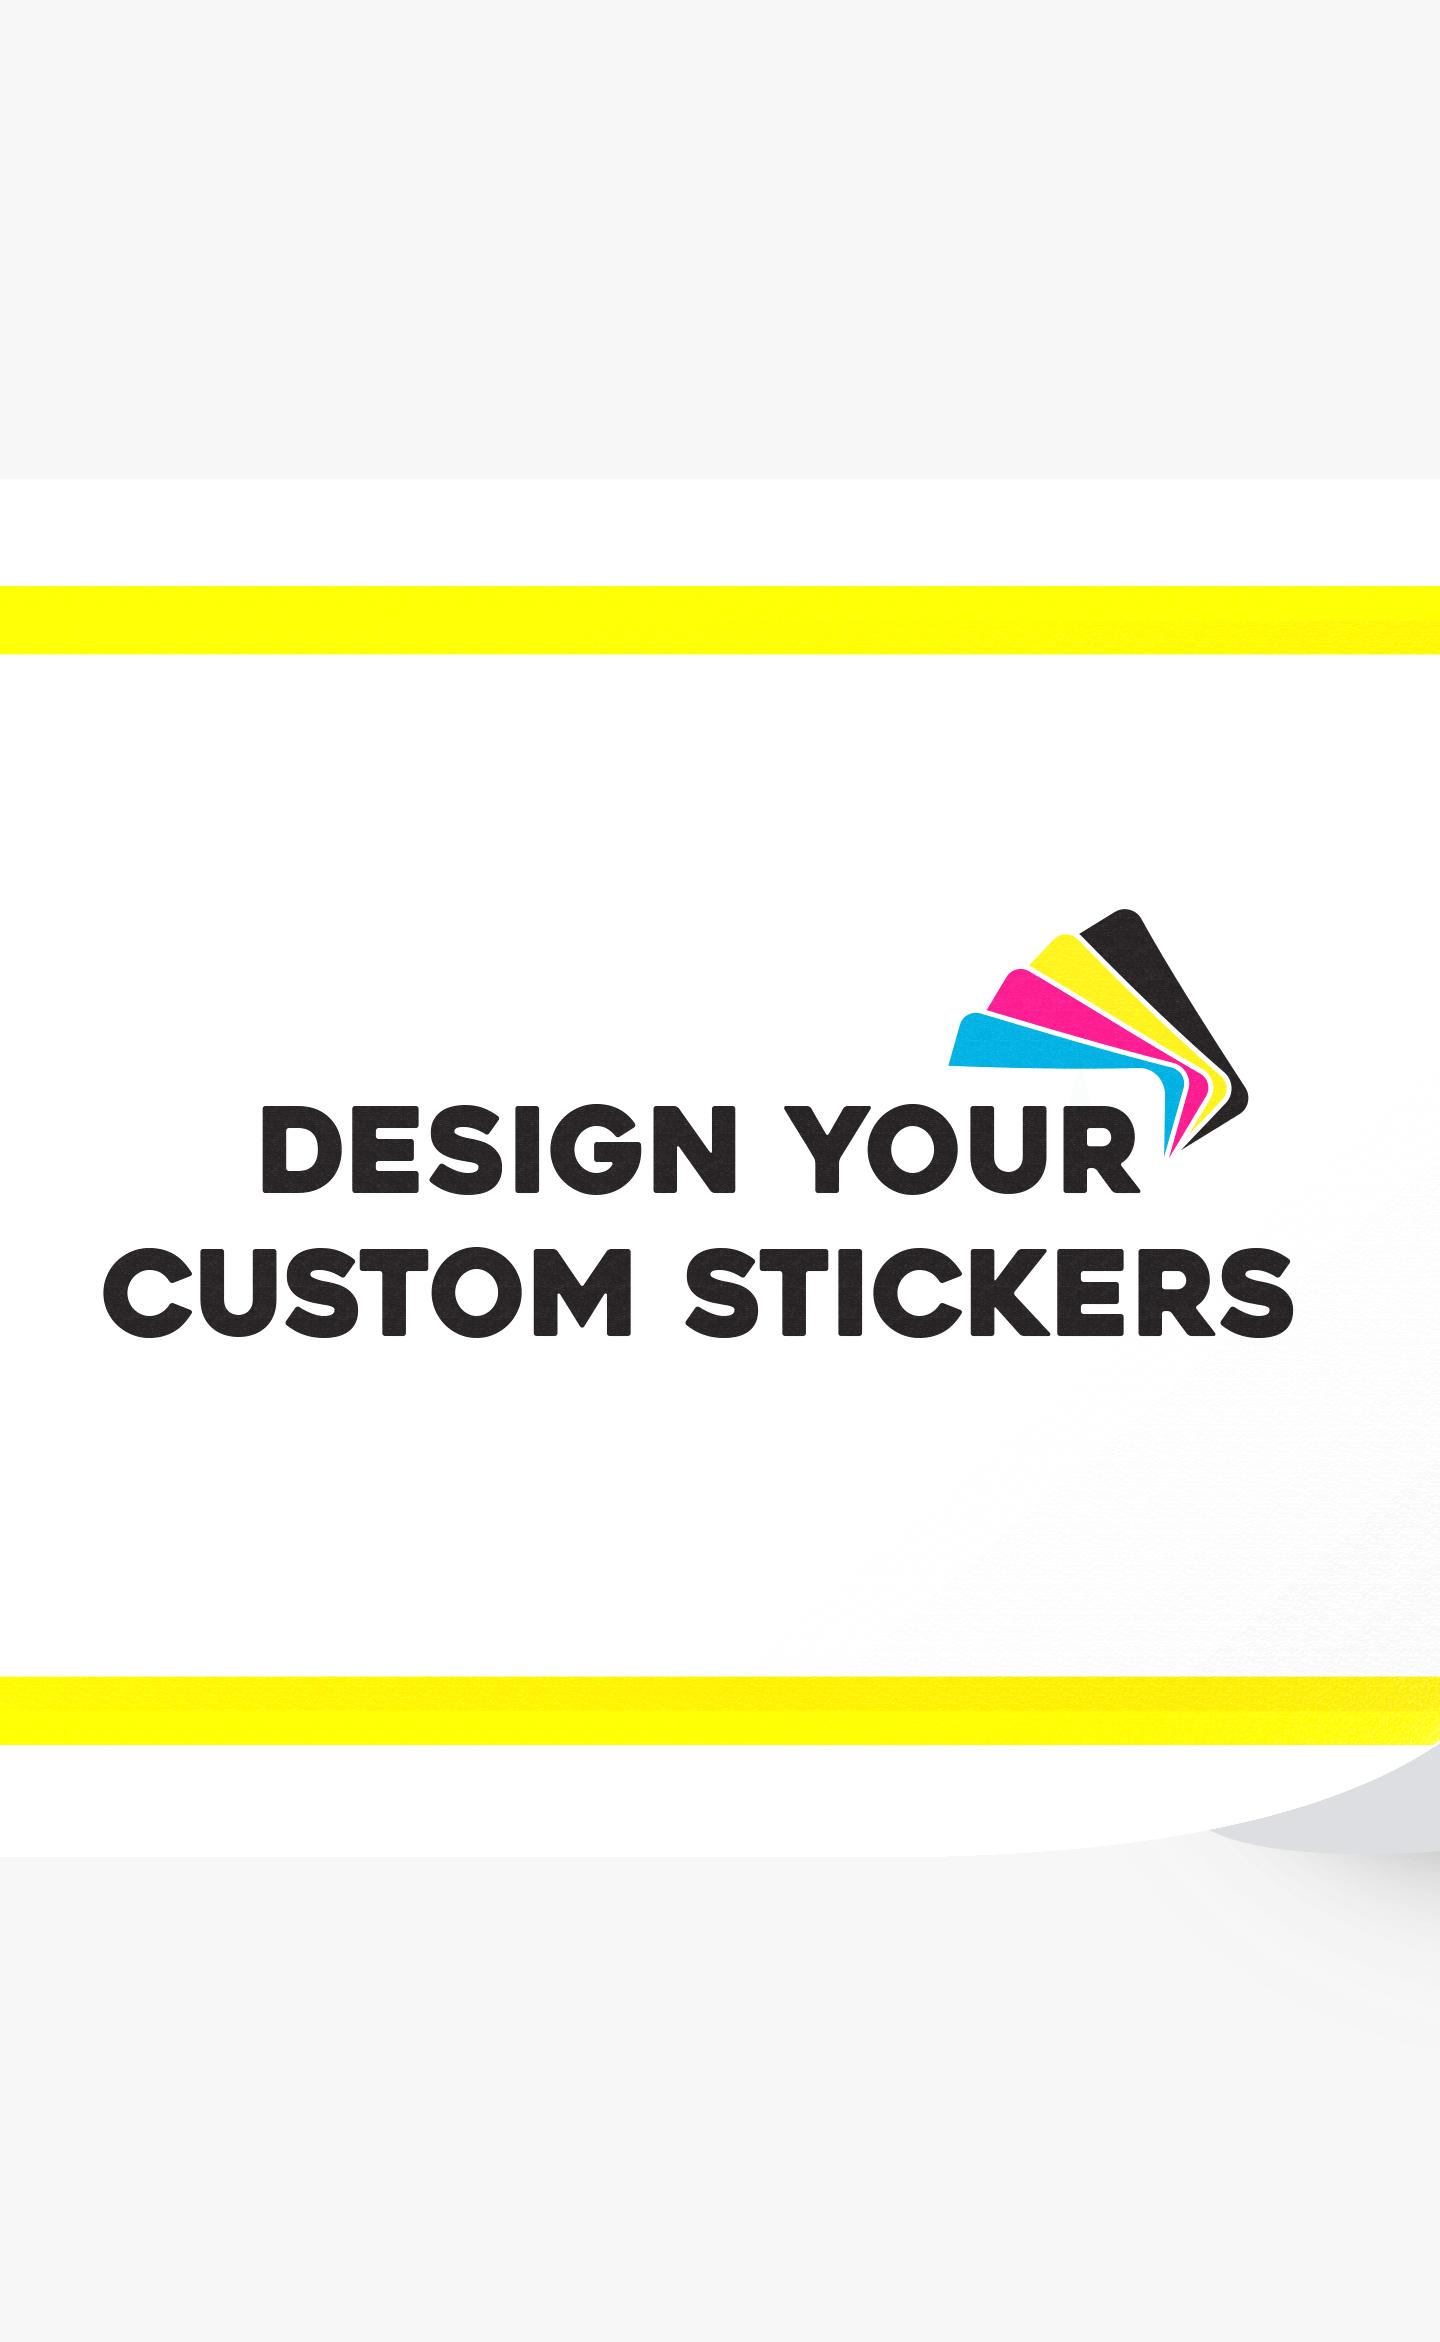 6x3 Custom Rectangle Stickers - Landscape